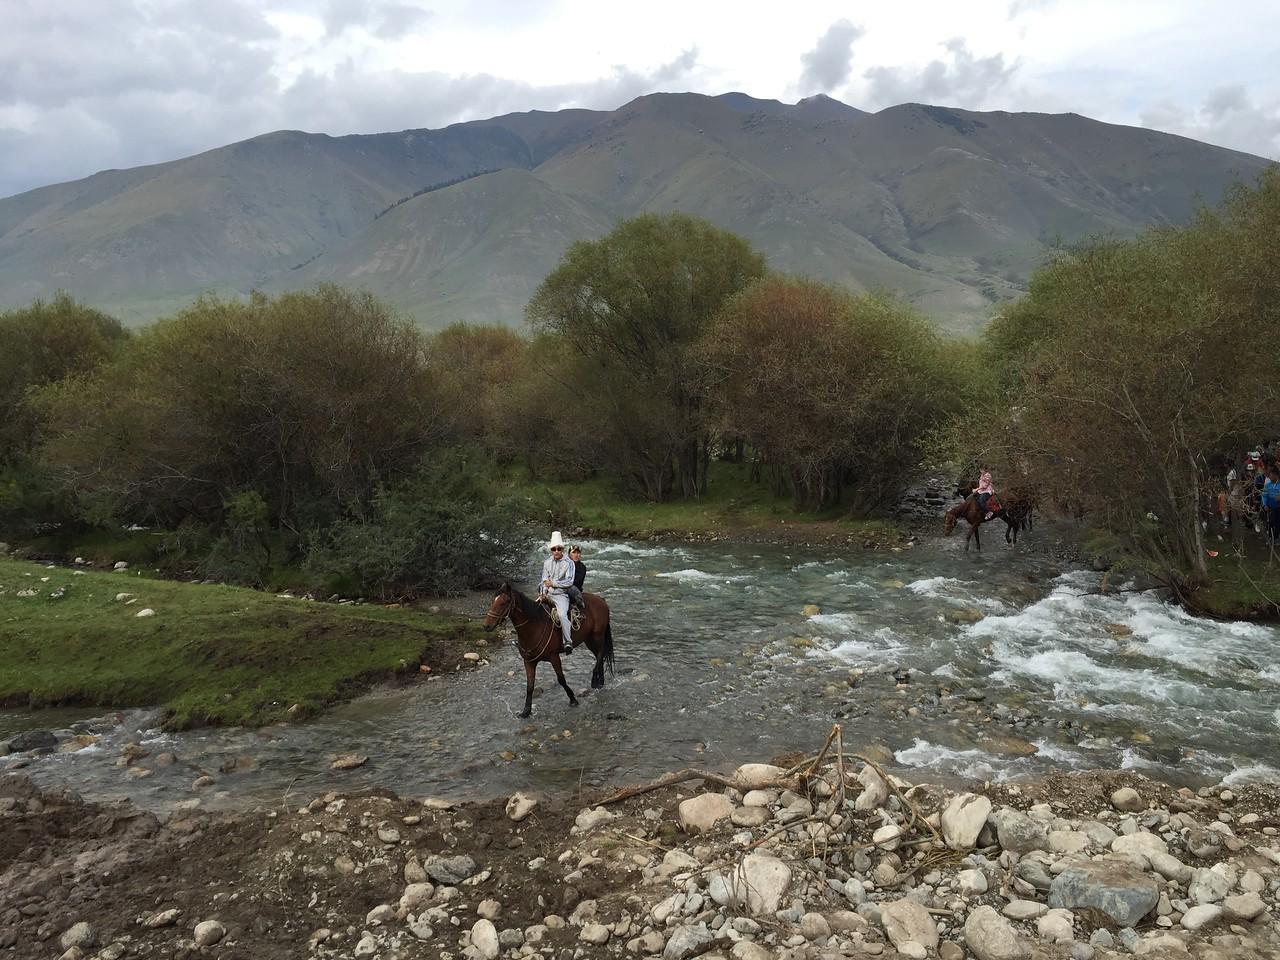 Kyrgyz Taxi Ride, Kyrchyn Gorge - World Nomad Games, Kyrgyzstan